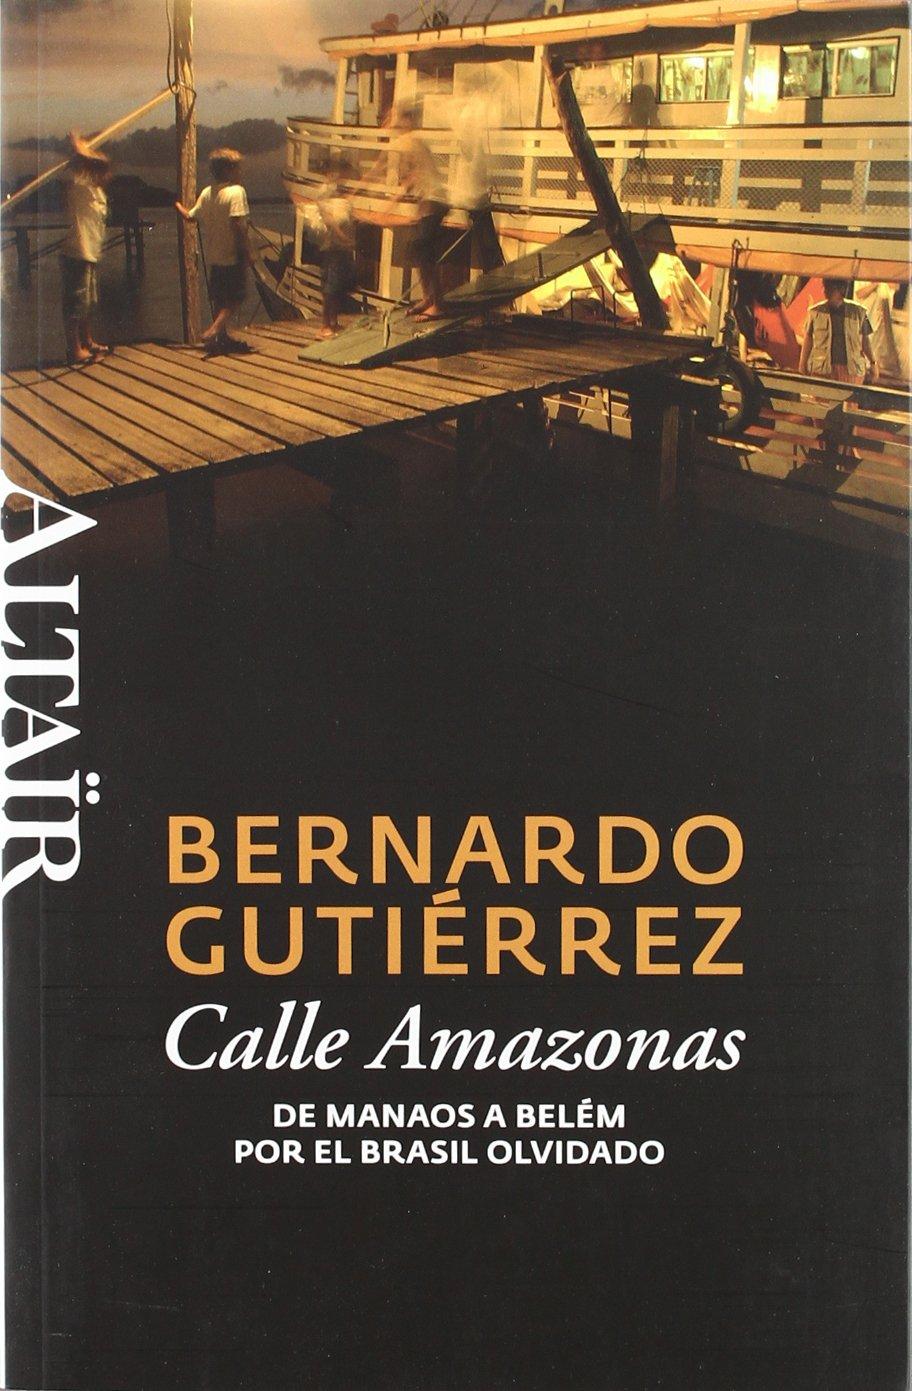 Calle Amazonas: De Manaos a Belém por el Brasil olvidado (HETERODOXOS) Tapa blanda – 23 nov 2010 Bernardo Gutiérrez González ALTAIR 8493755532 Brazil